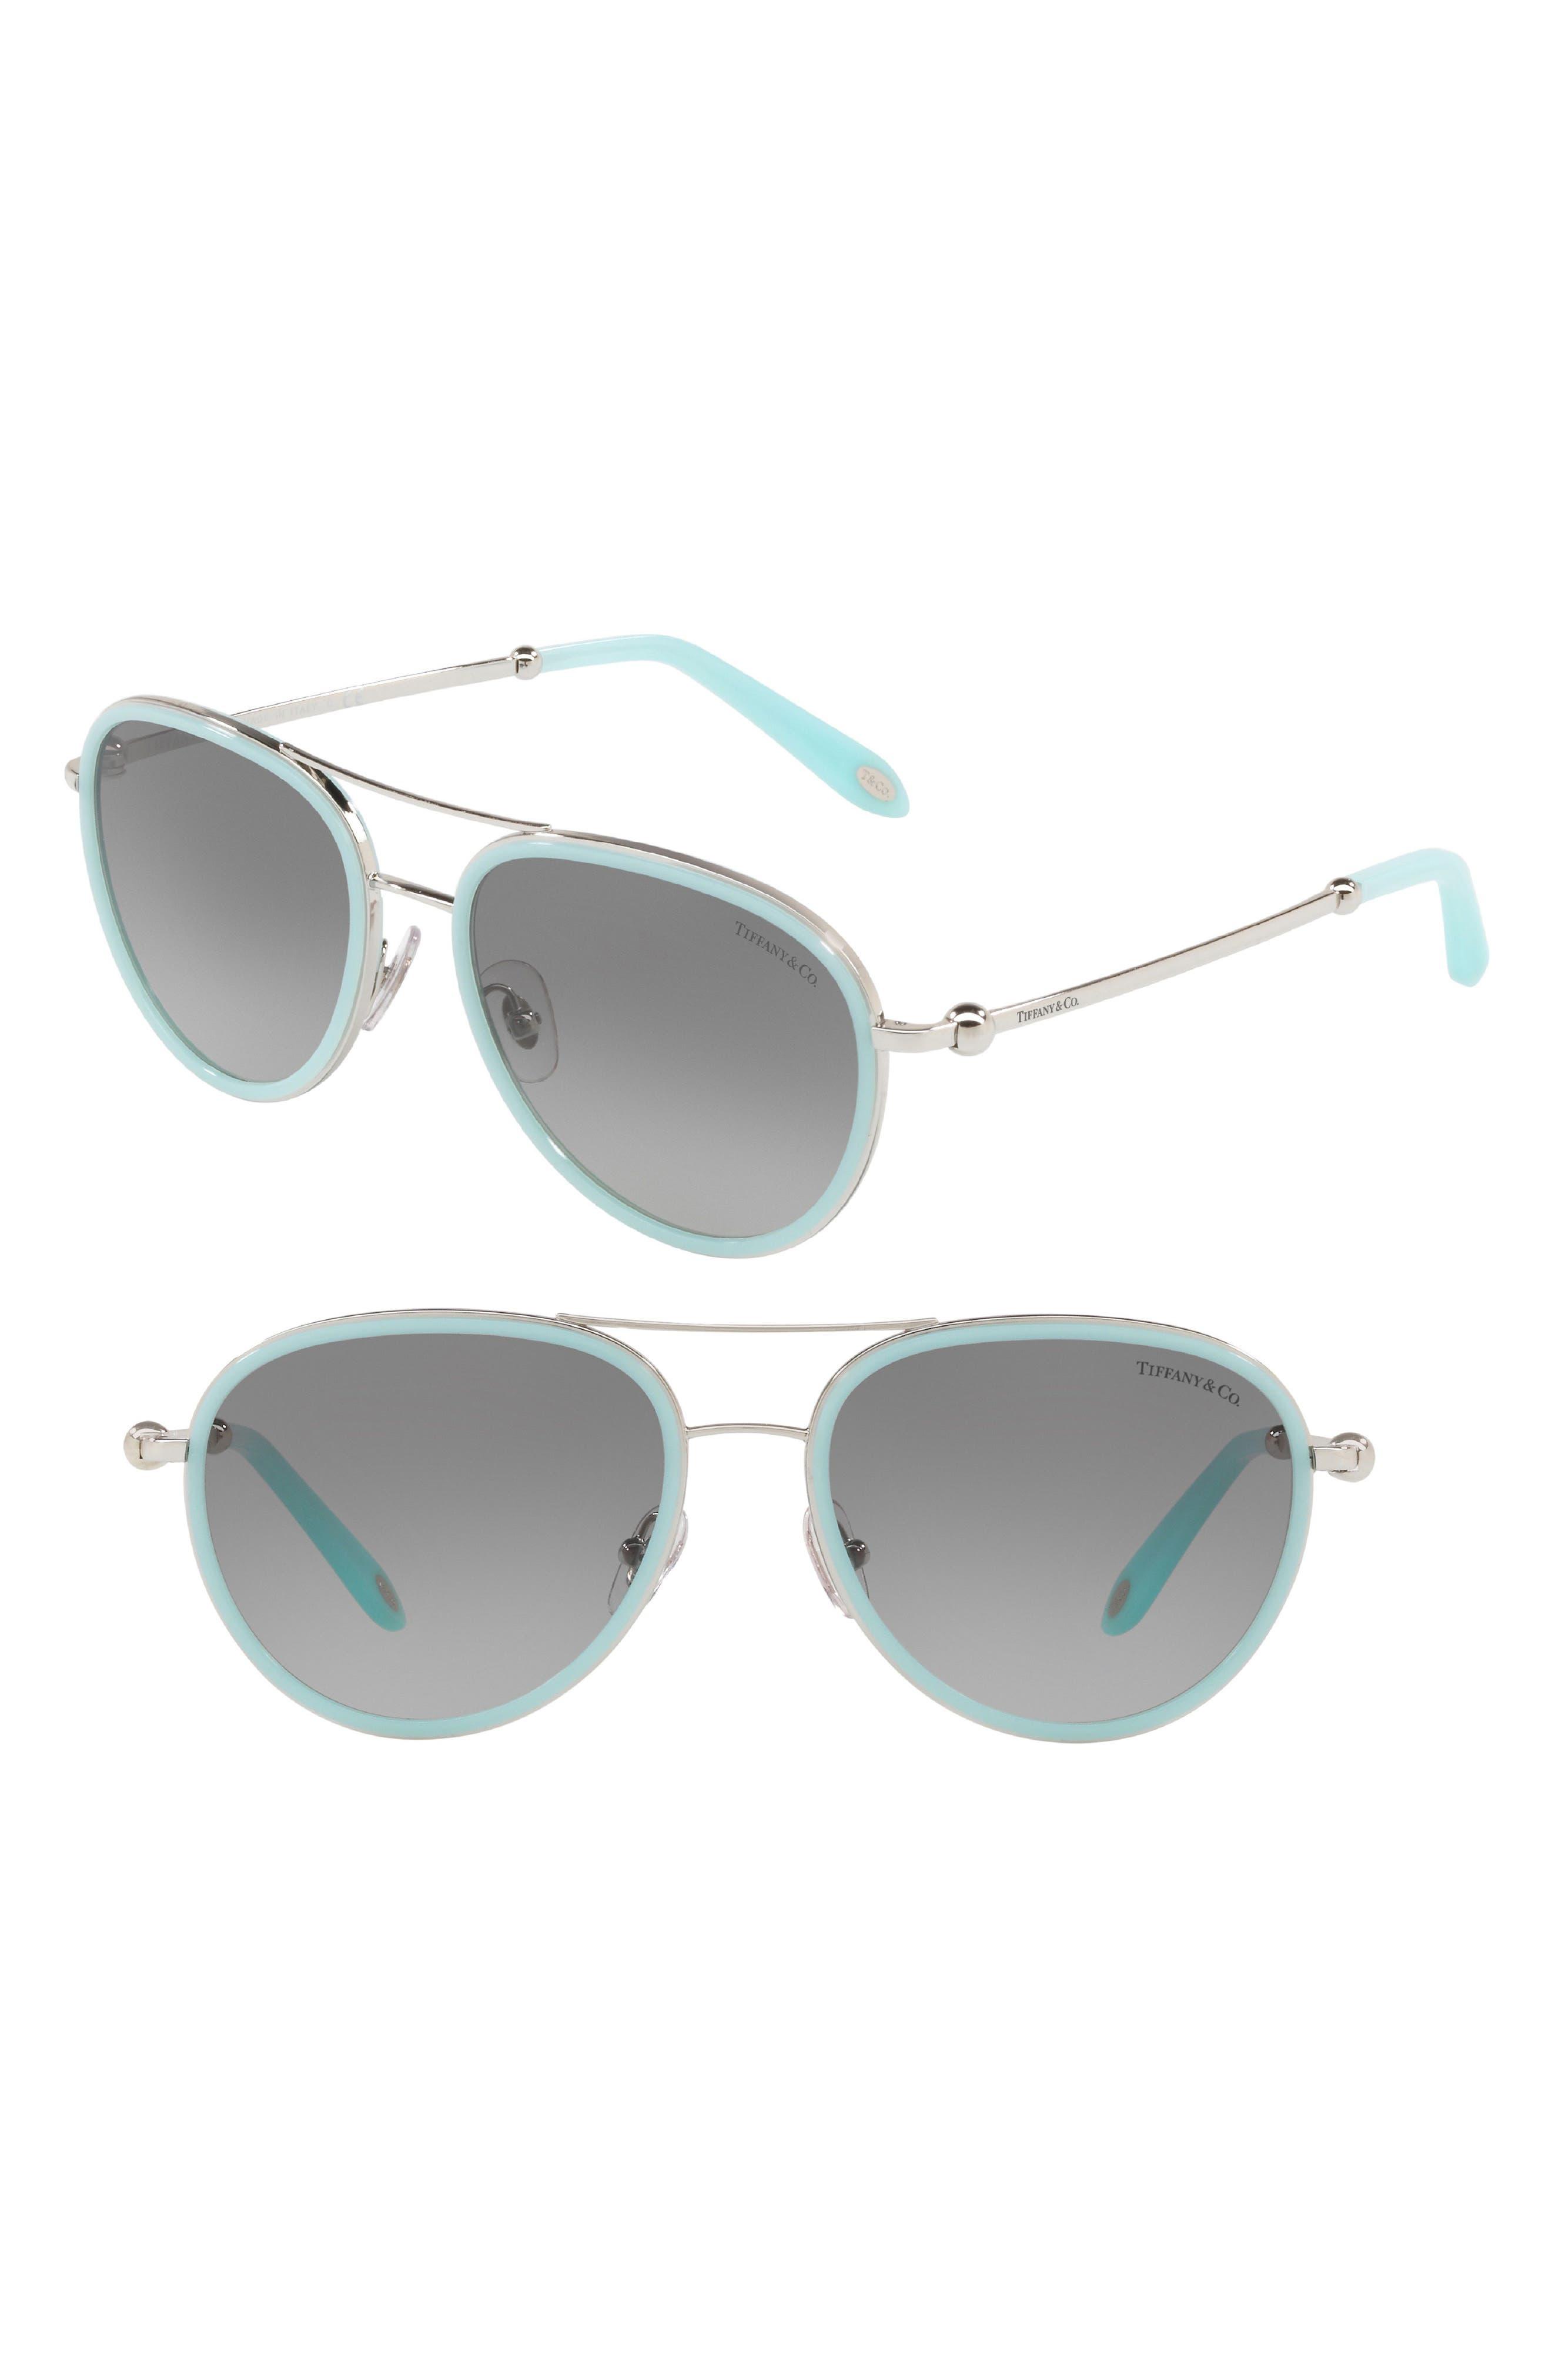 55mm Gradient Aviator Sunglasses,                         Main,                         color, BLUE GRADIENT